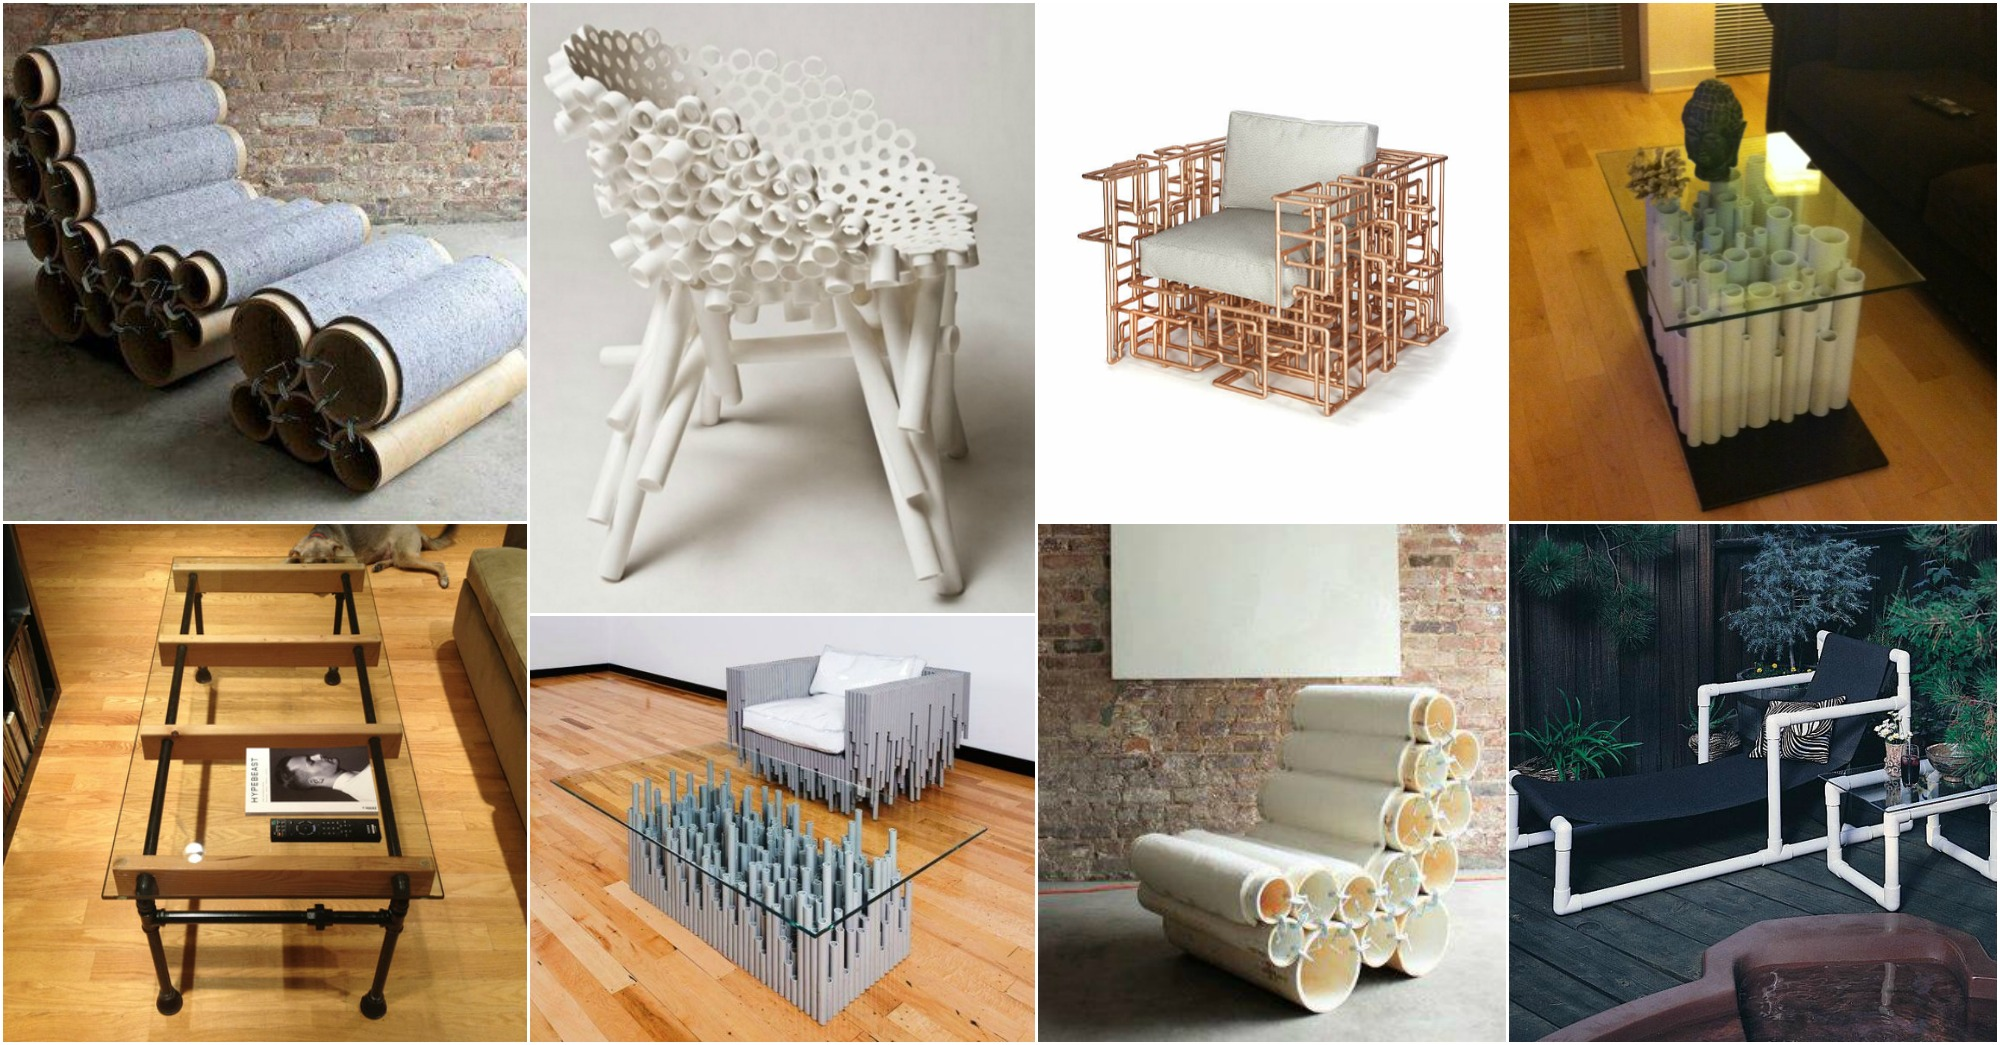 15 ideas de muebles con tuberia pvc que te fascinan